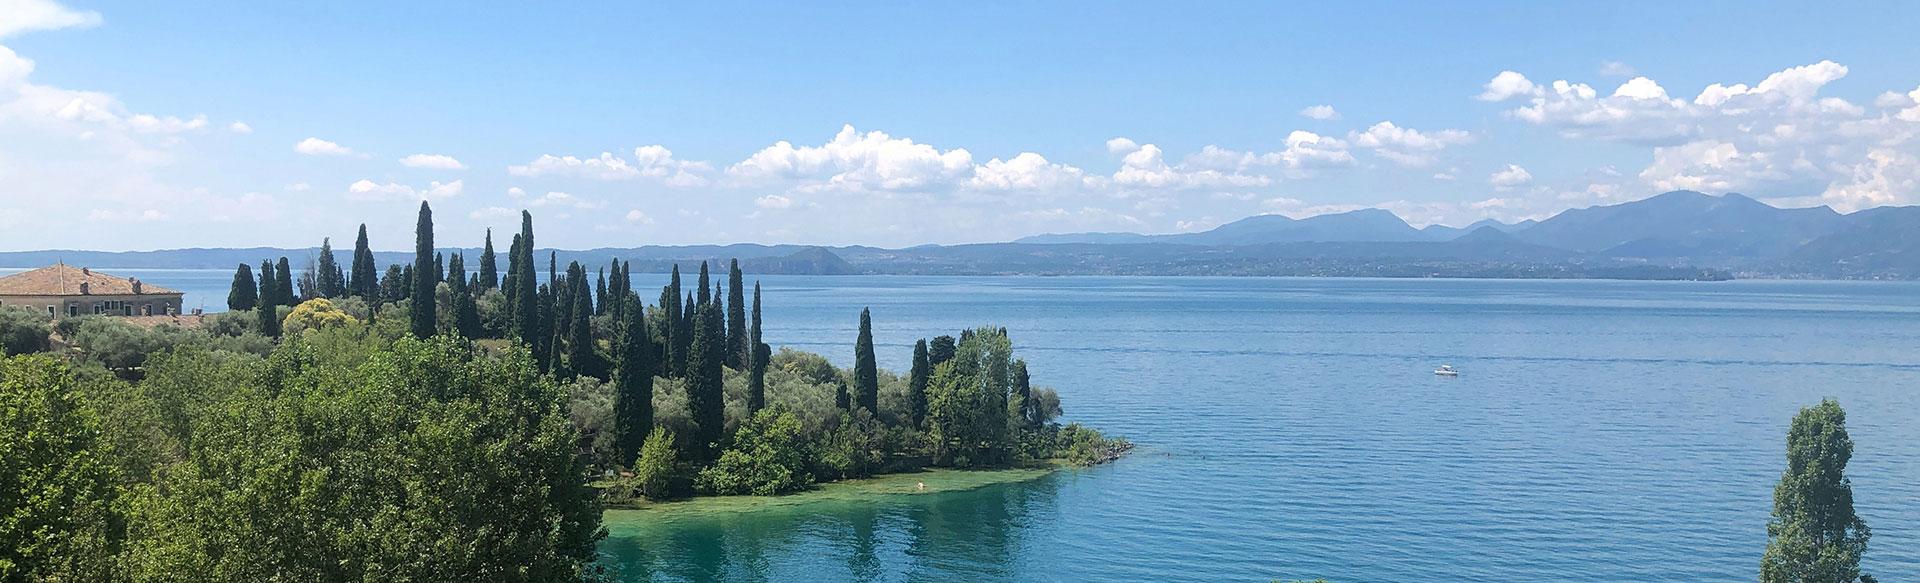 Green Villas Gardone Riviera vista lago